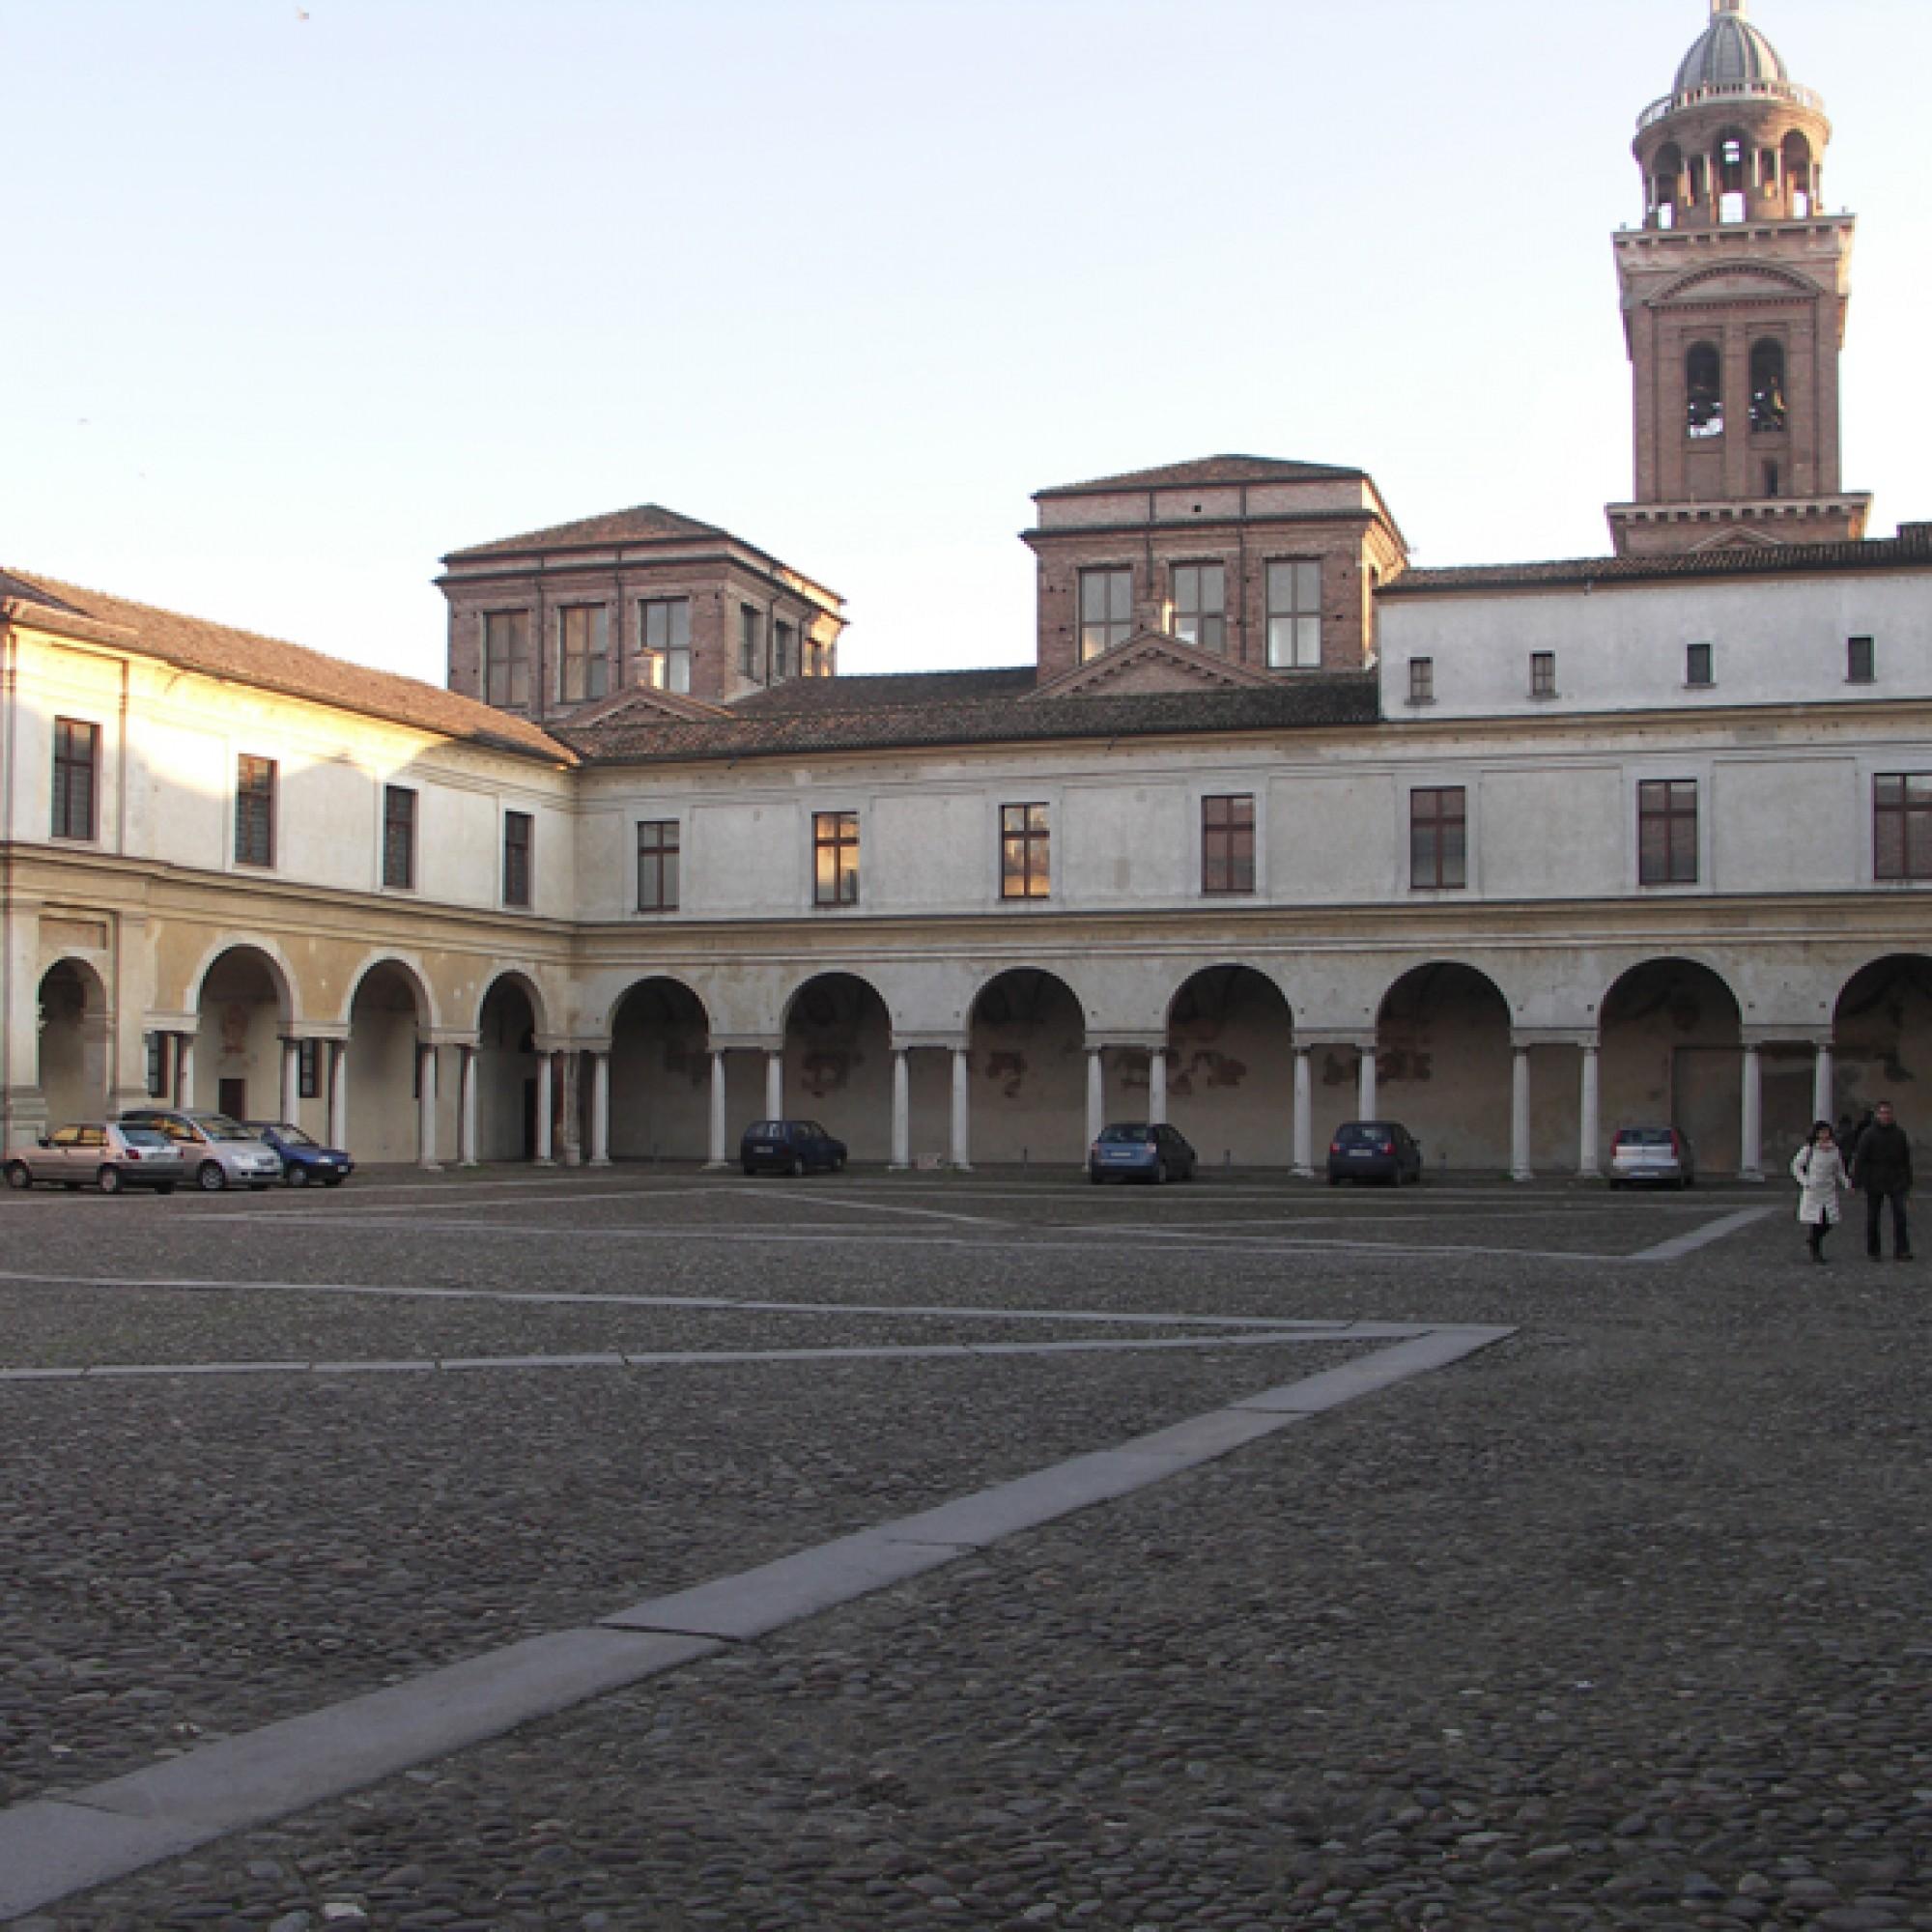 1,5 Millionen Euro fliessen in die Restaurierung des Palazzo Ducale in Mantua. (Foto: Emmeu_Wikimedia Commons)